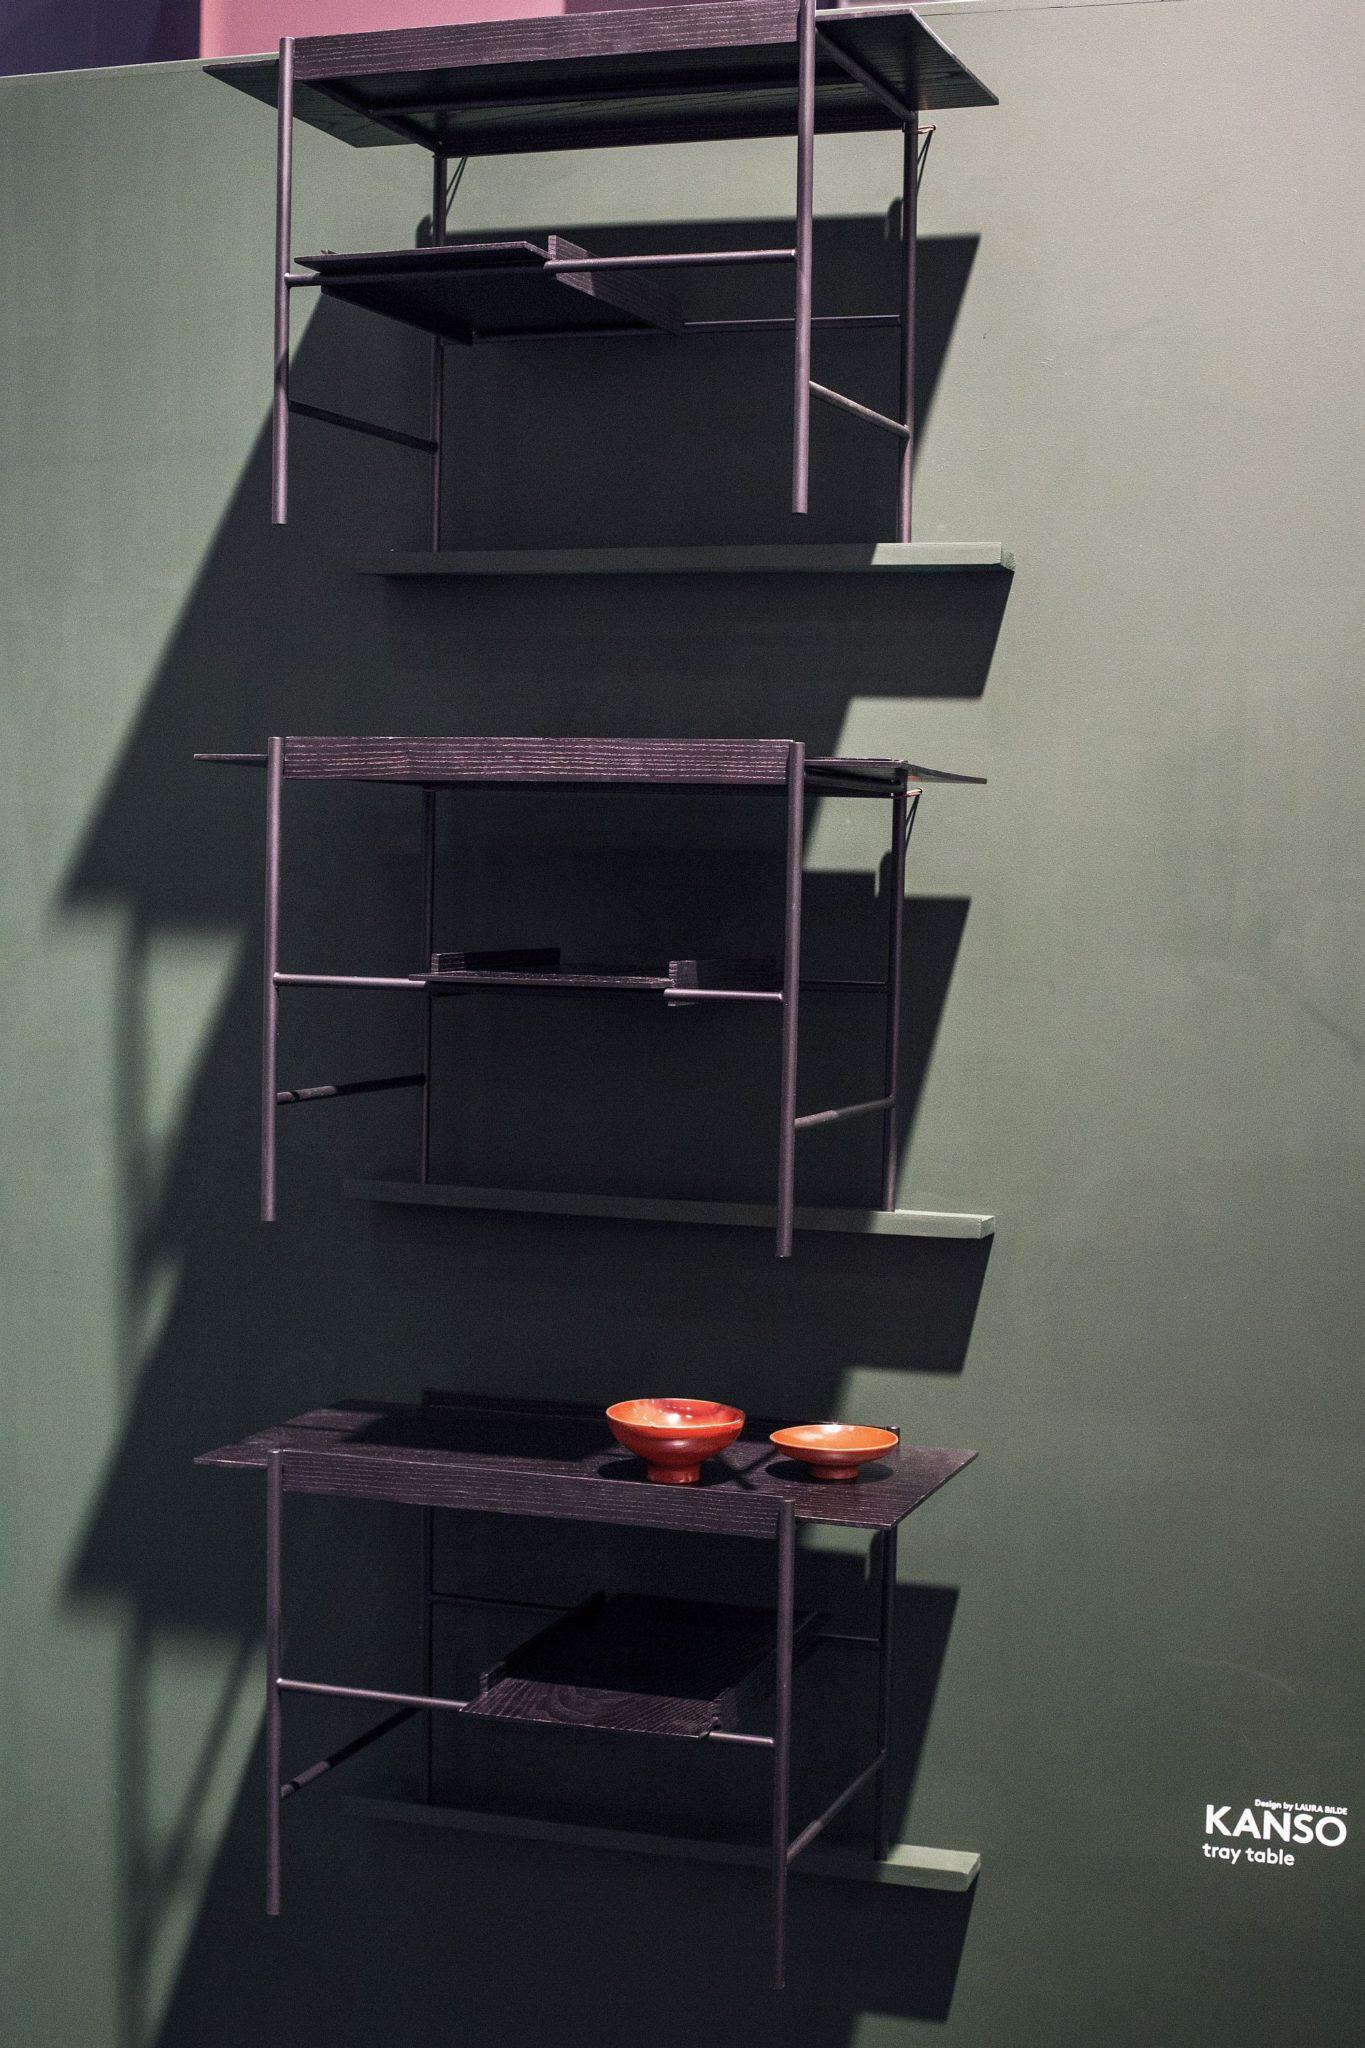 Minimal modular wall-mounted shelves